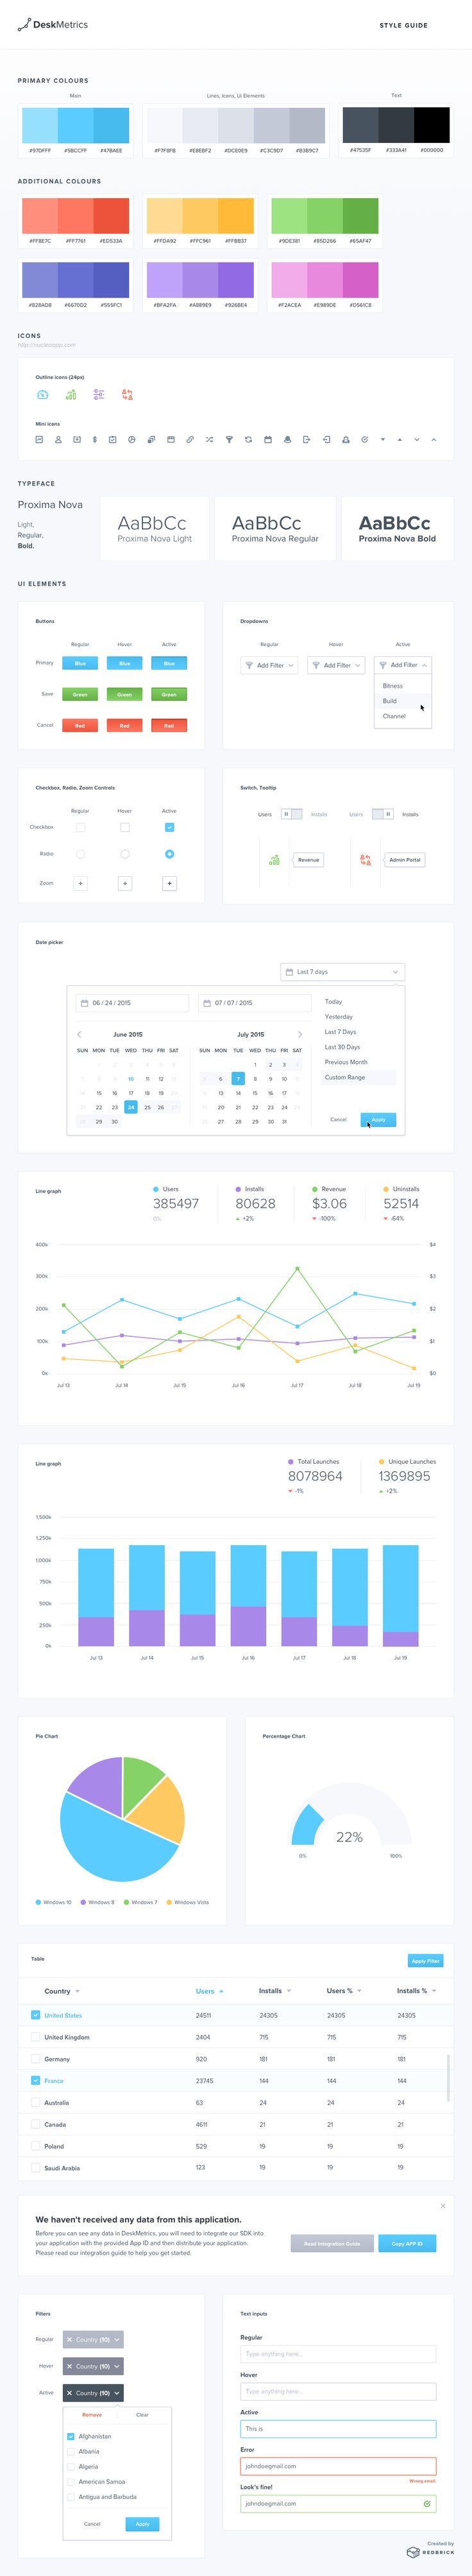 Dribbble - deskmetrics_ui_style_guide_-_full_view.png by Mateusz Dembek